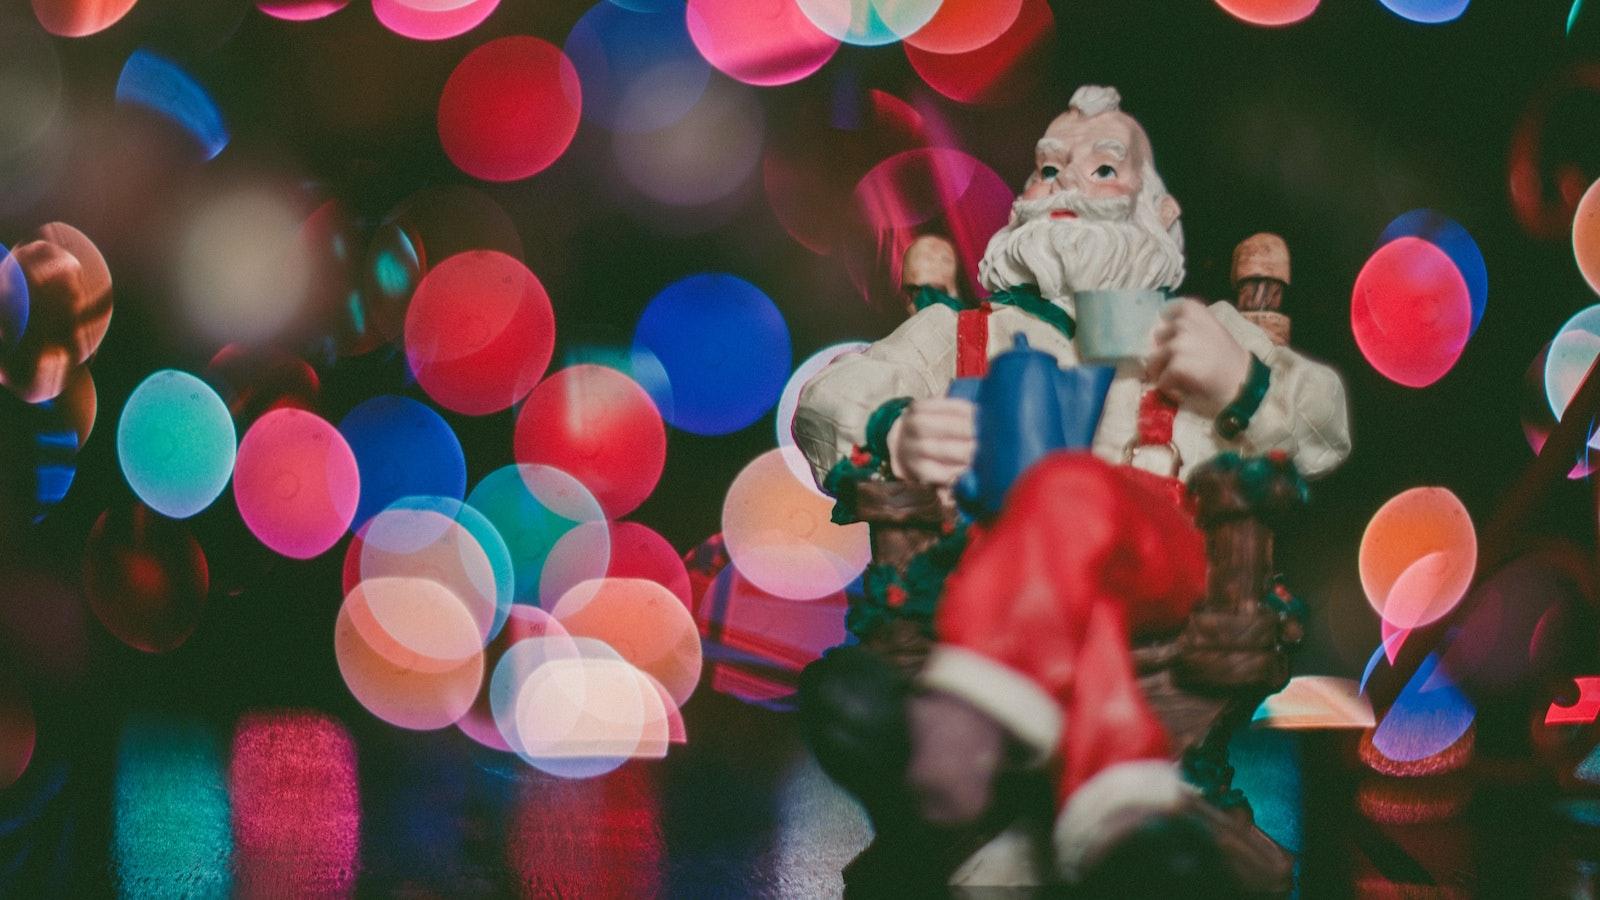 santa claus harmless fun or tragic distraction desiring god